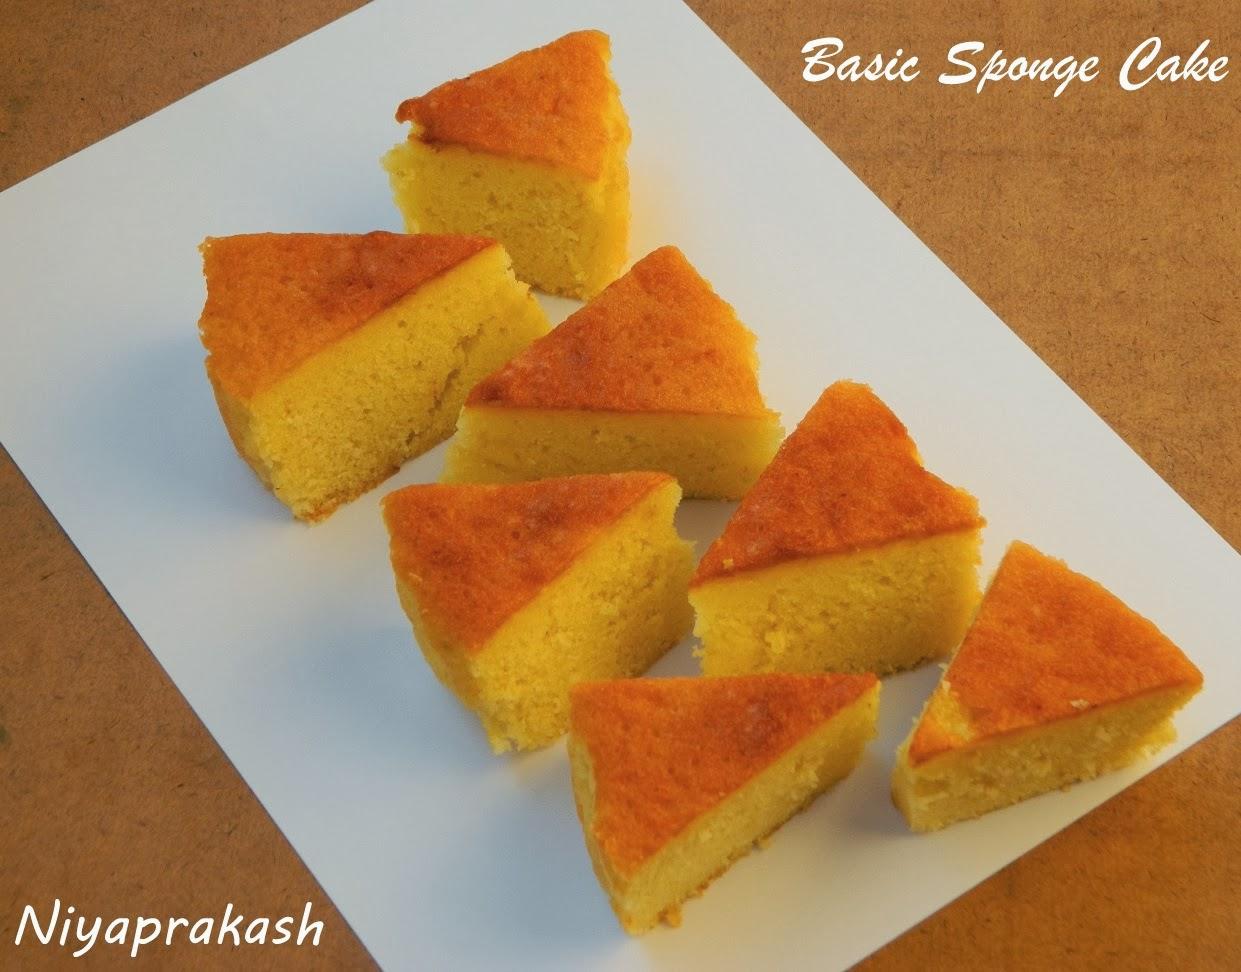 Maida Flour In Uk Same As Cake Flour